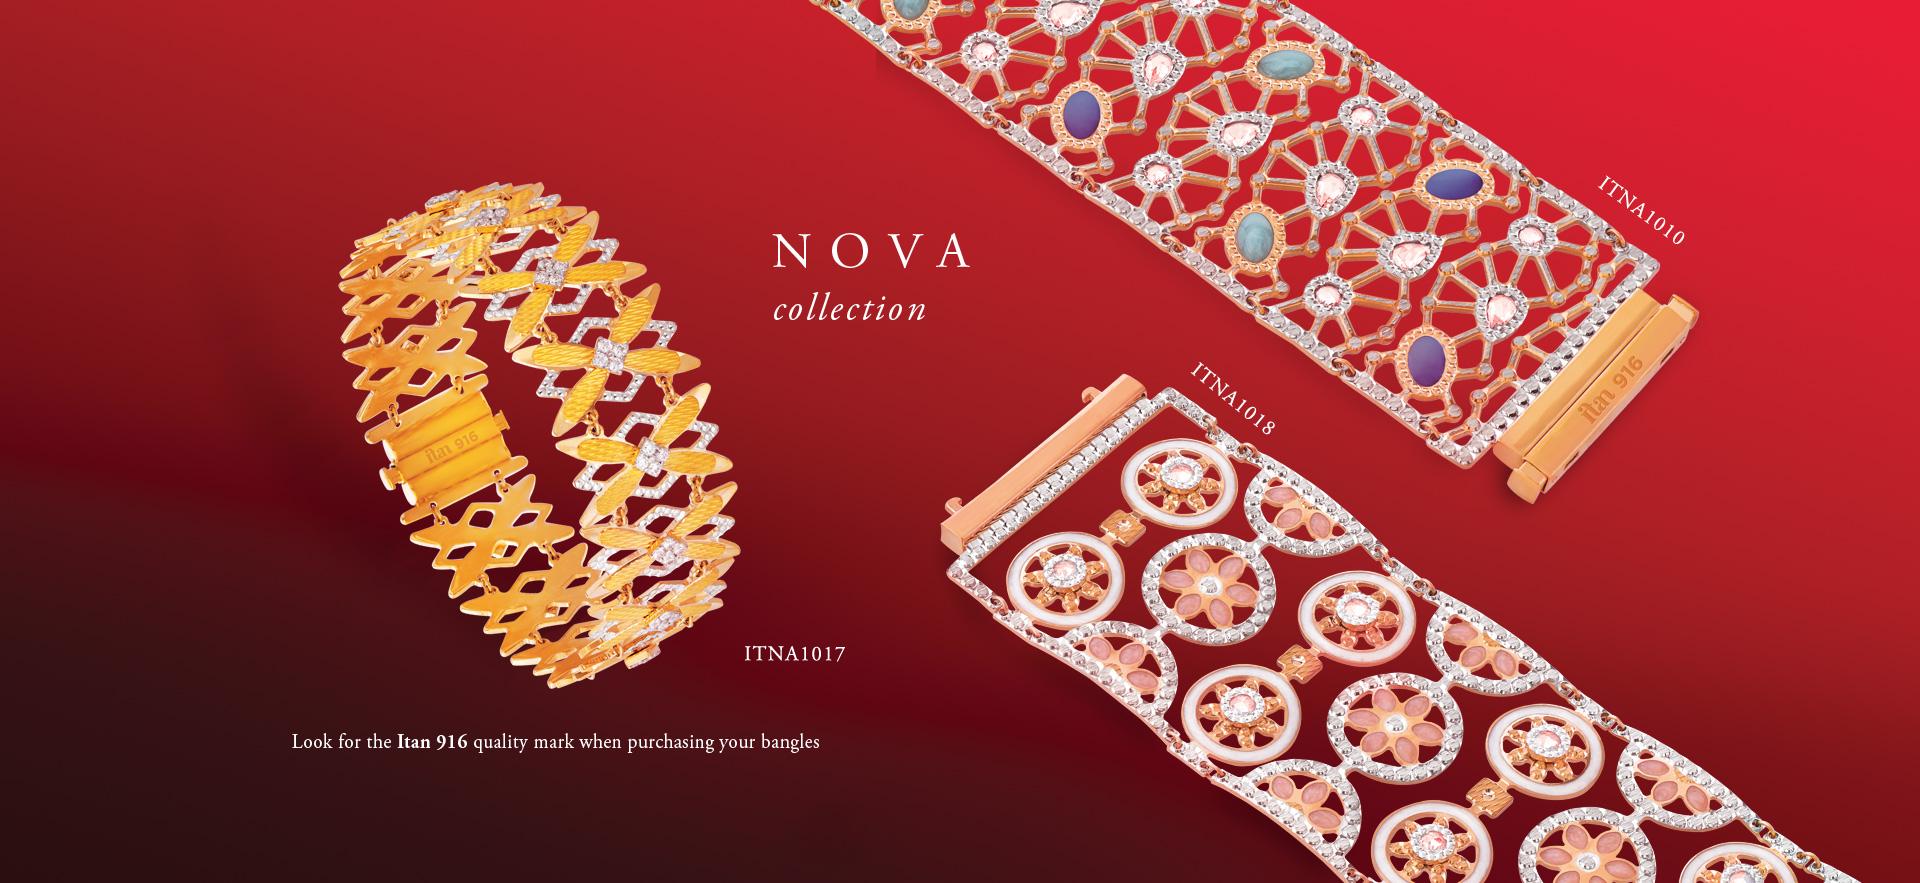 Itan_Nova_Gold_Jewellery_Bracelet_Dubai_